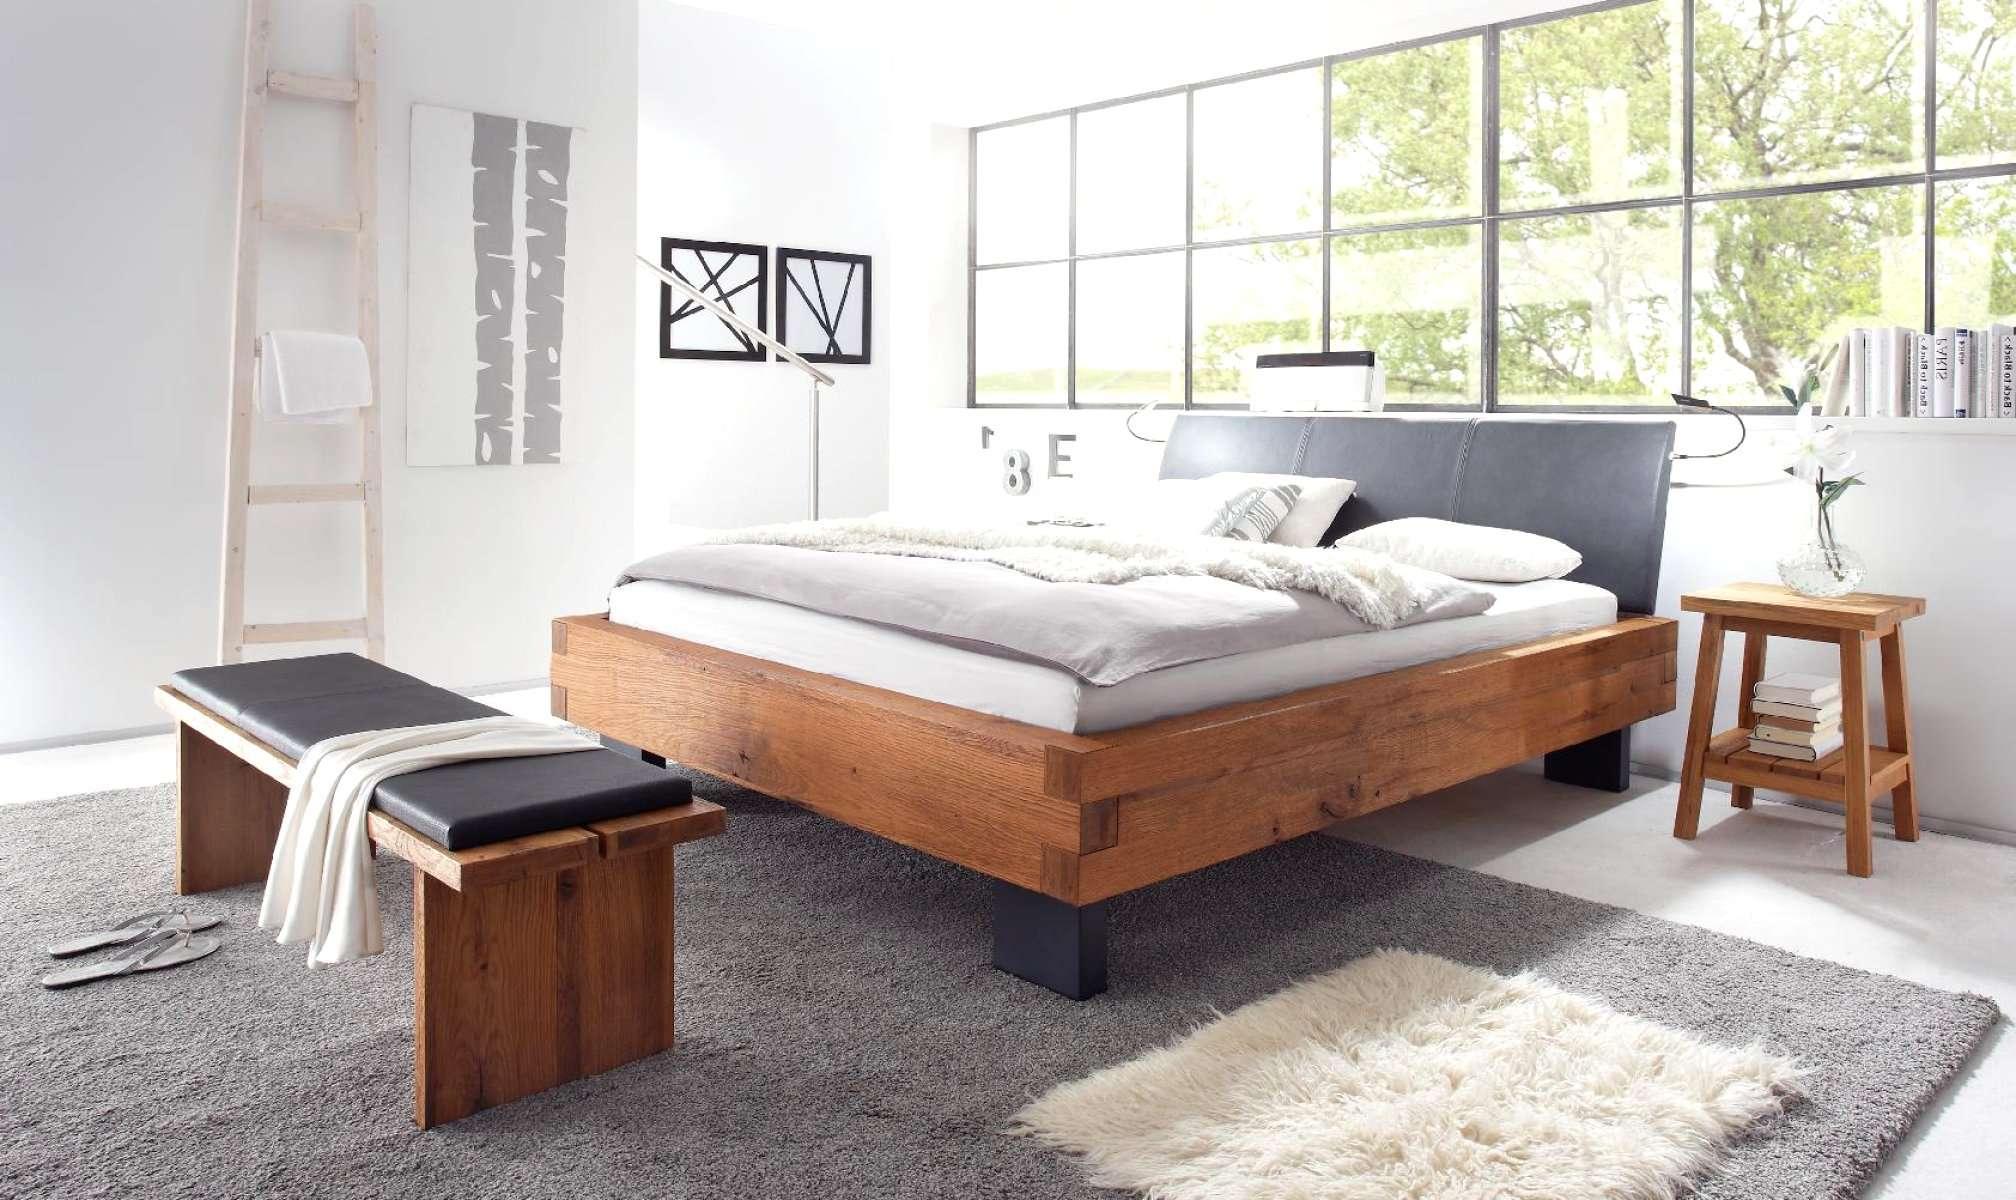 wasserbett xl bewertung aufbau wasserbett silvano plus with wasserbett xl bewertung awesome. Black Bedroom Furniture Sets. Home Design Ideas